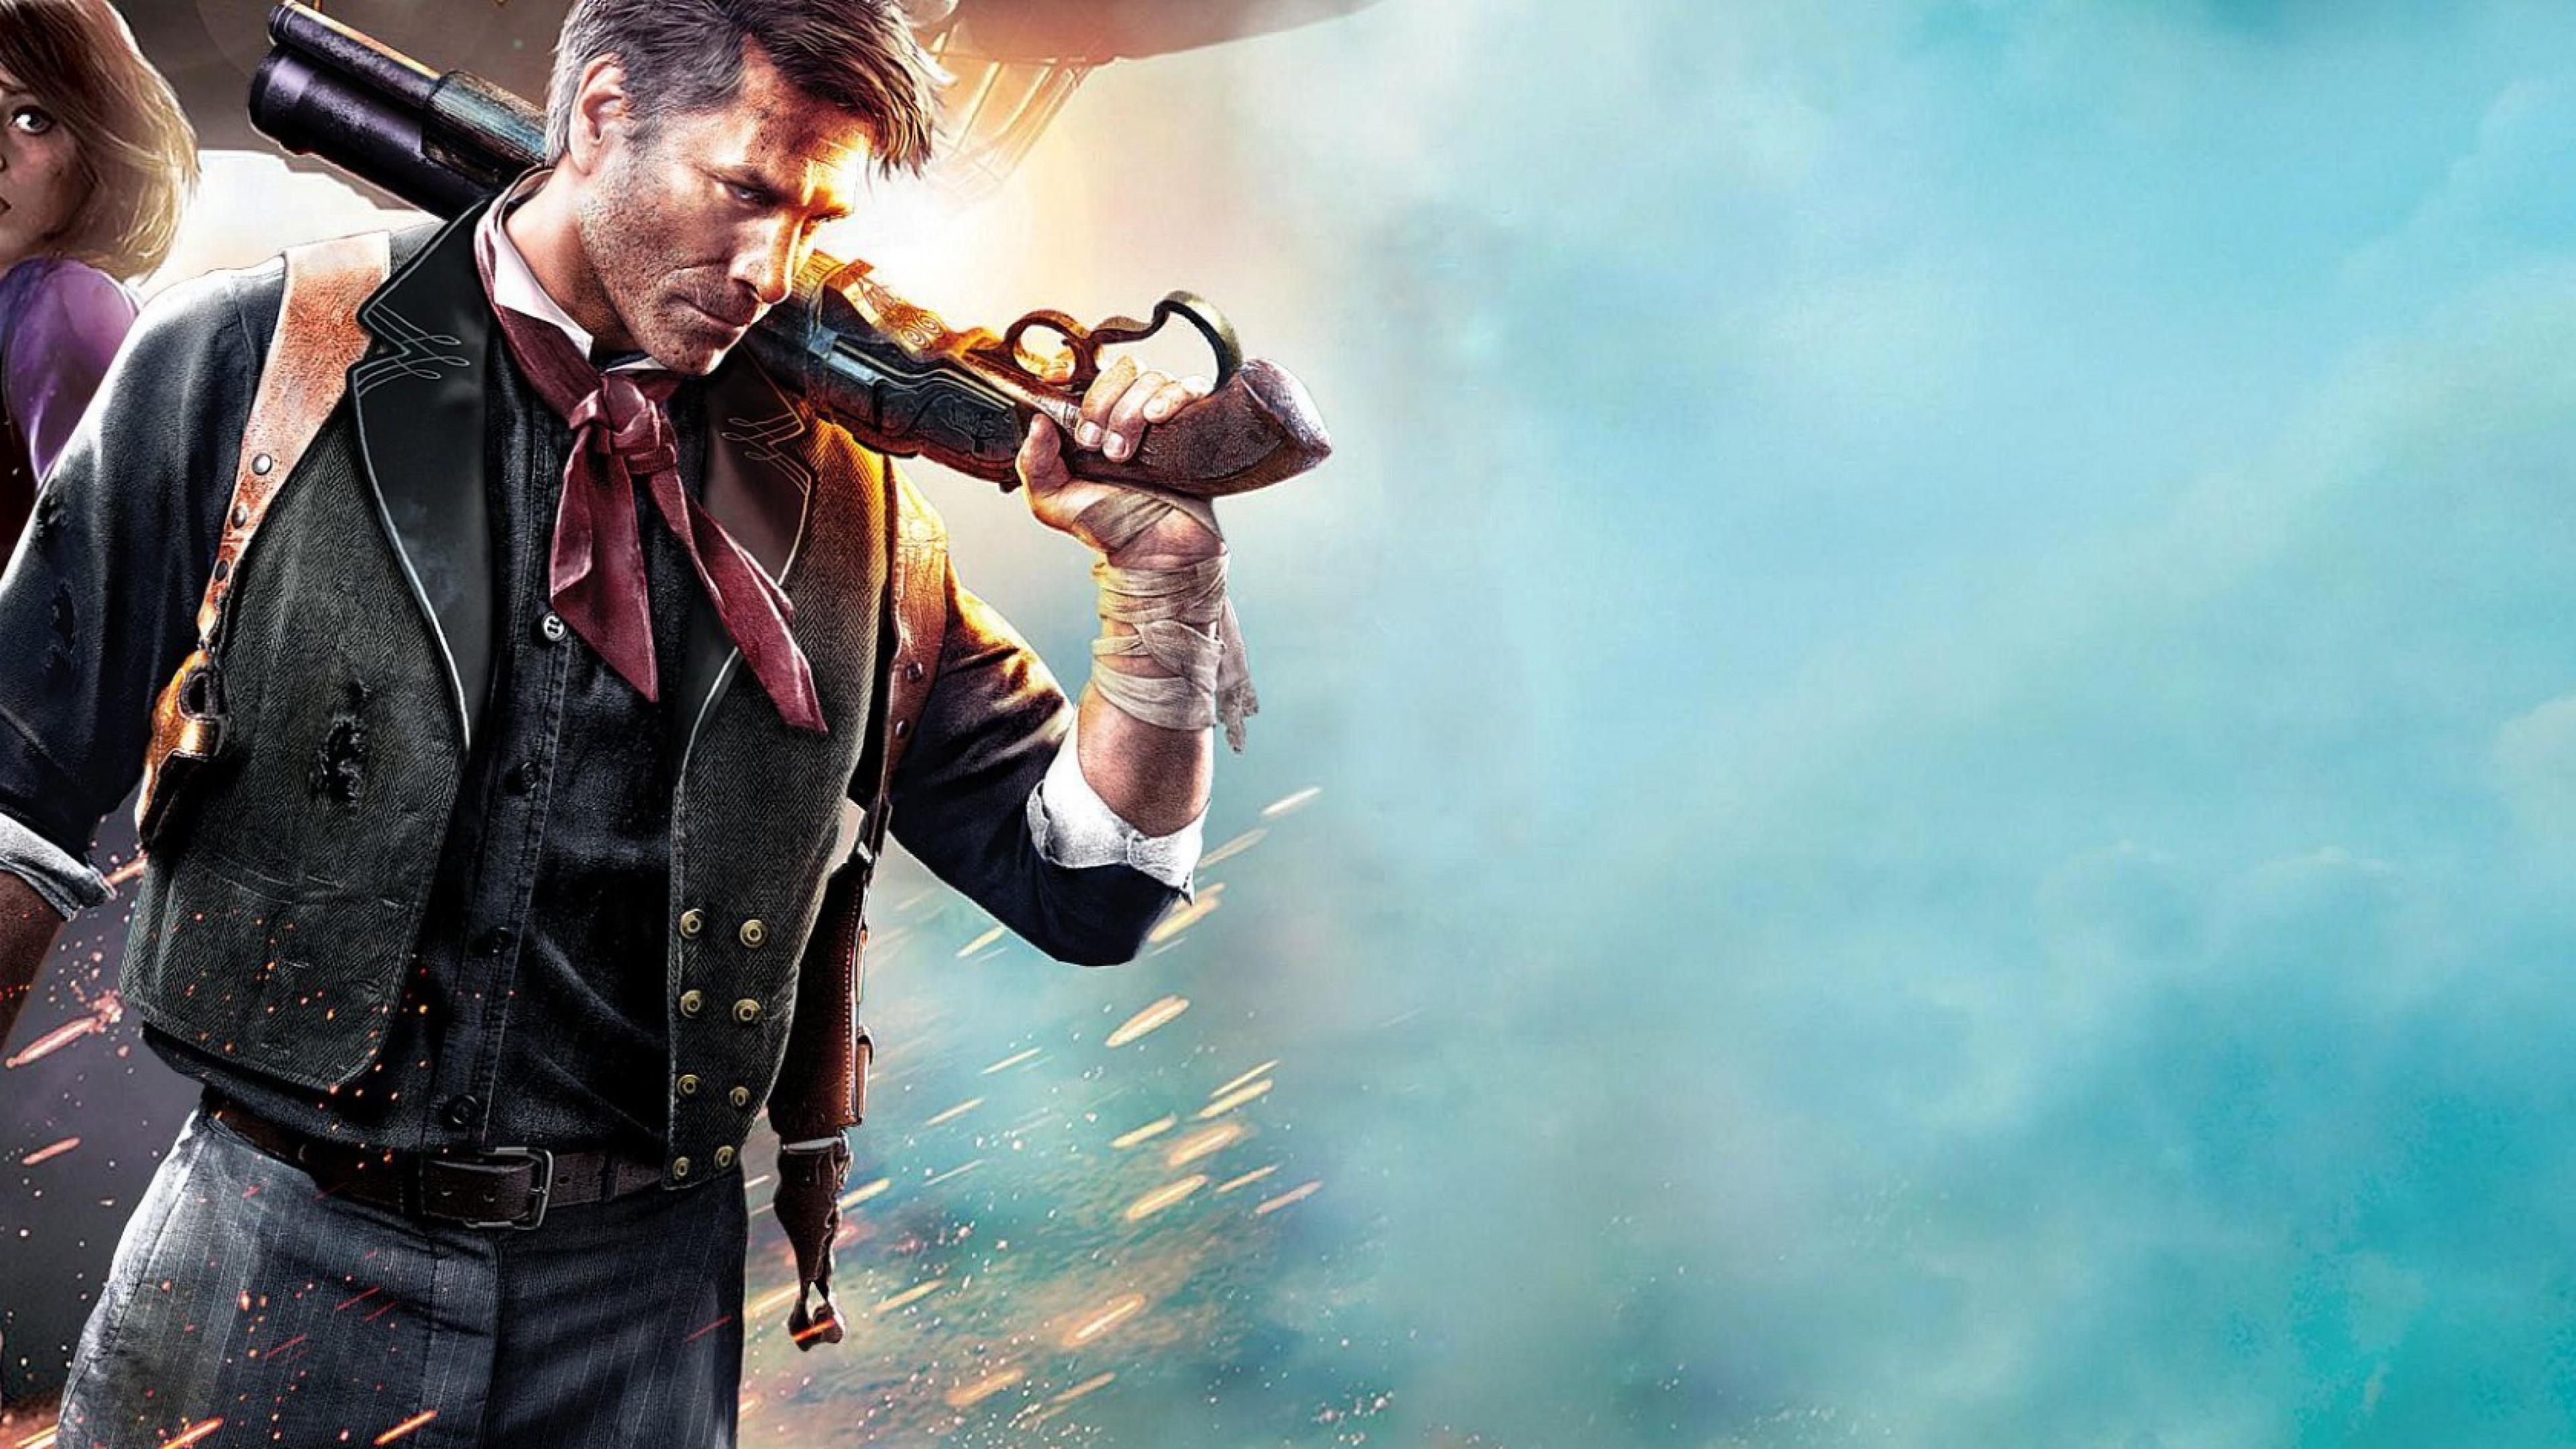 2016 Bioshock Infinite Game 2560×1080 Resolution